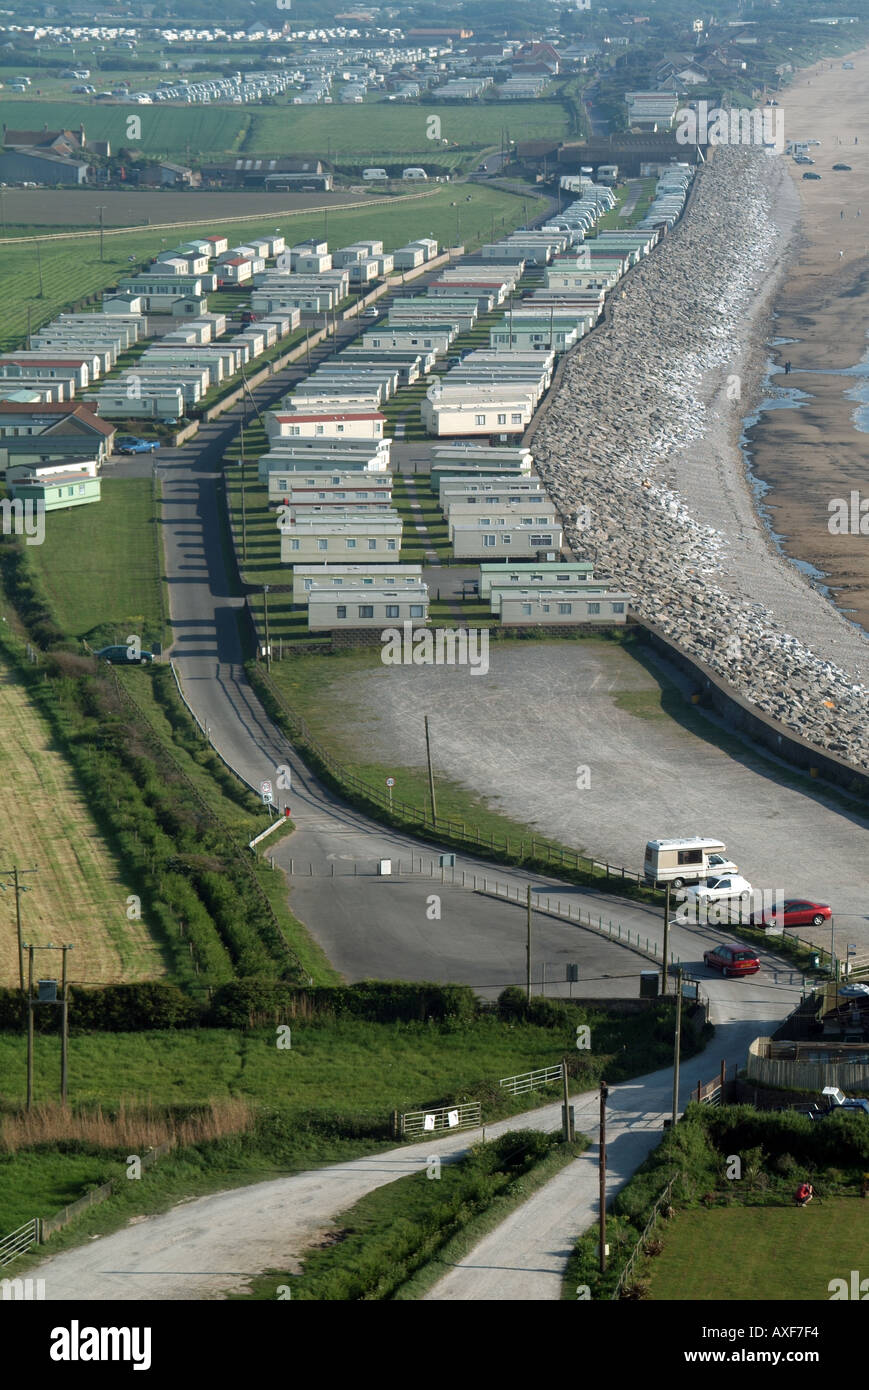 Brean Near Burnham On Sea Semi Aerial View Of Waterside Caravan Mobile Home Park